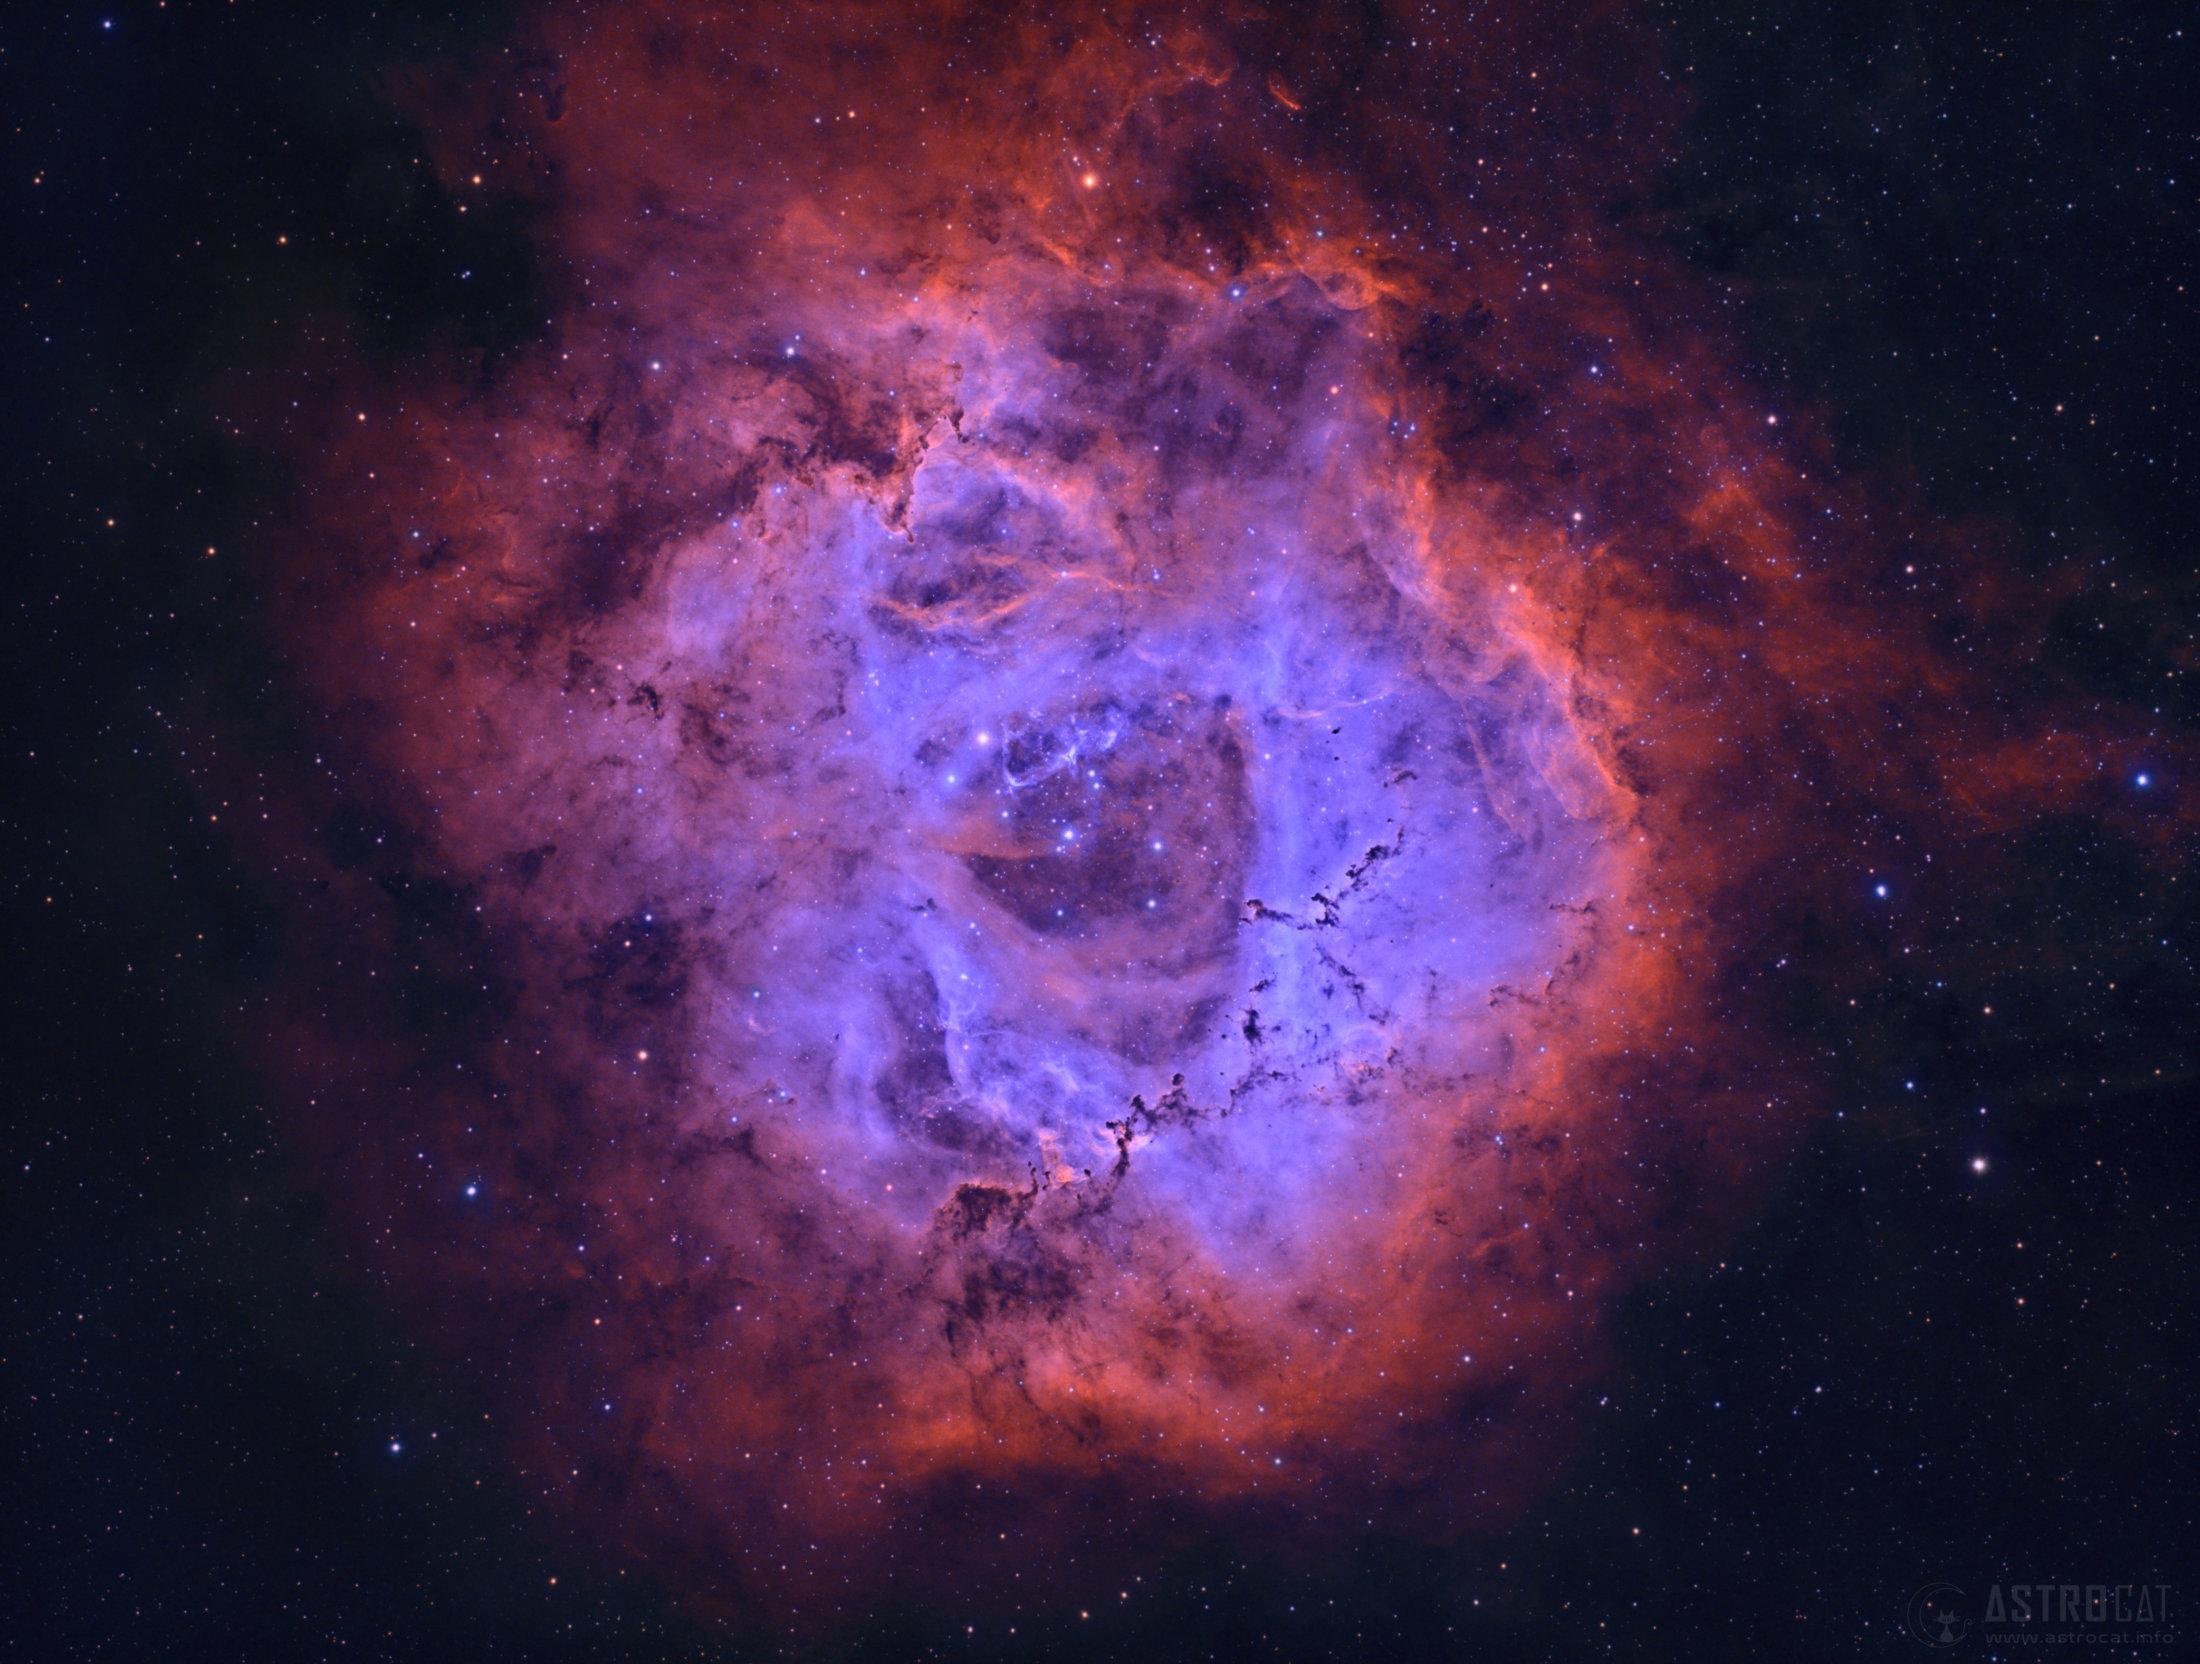 Nebulosa Rosetta - NGC 2237 - Aleix Roig